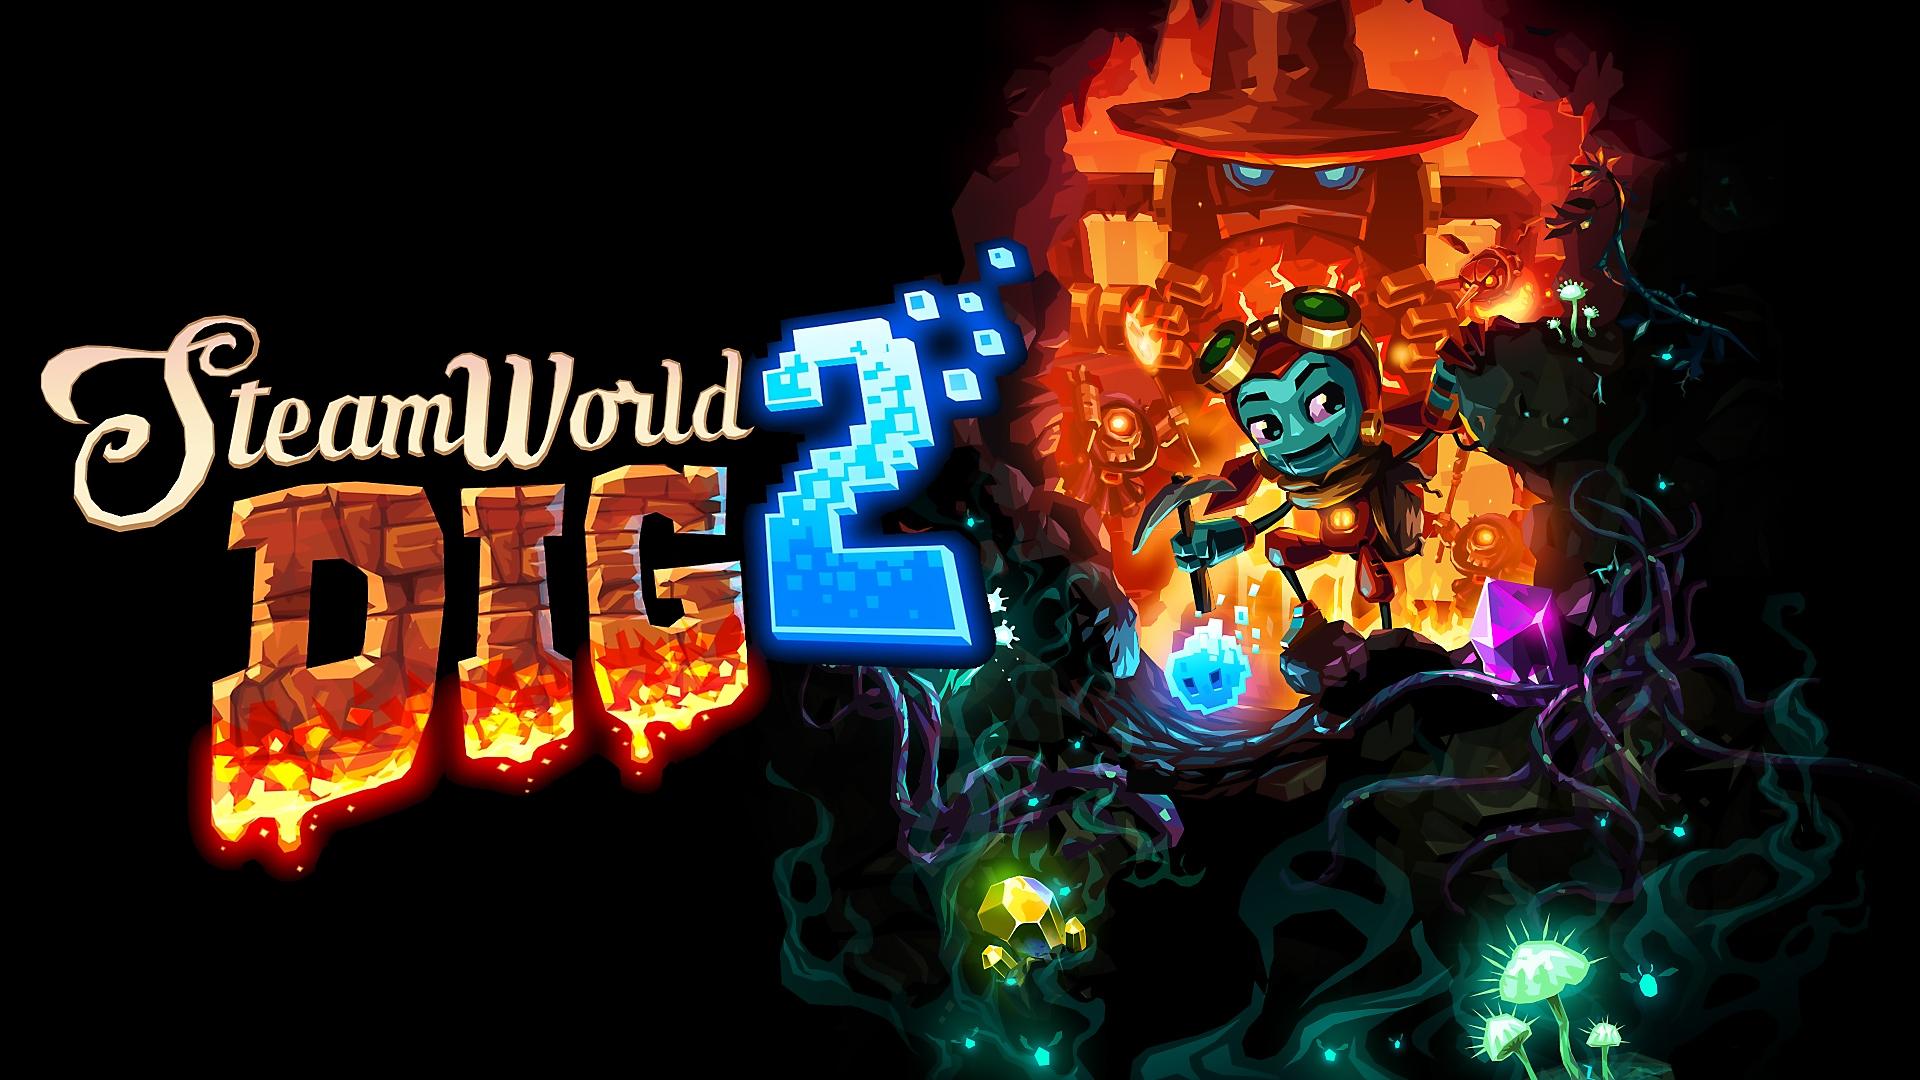 Steamworld Dig 2 - العرض التشويقي لإطلاق اللعبة